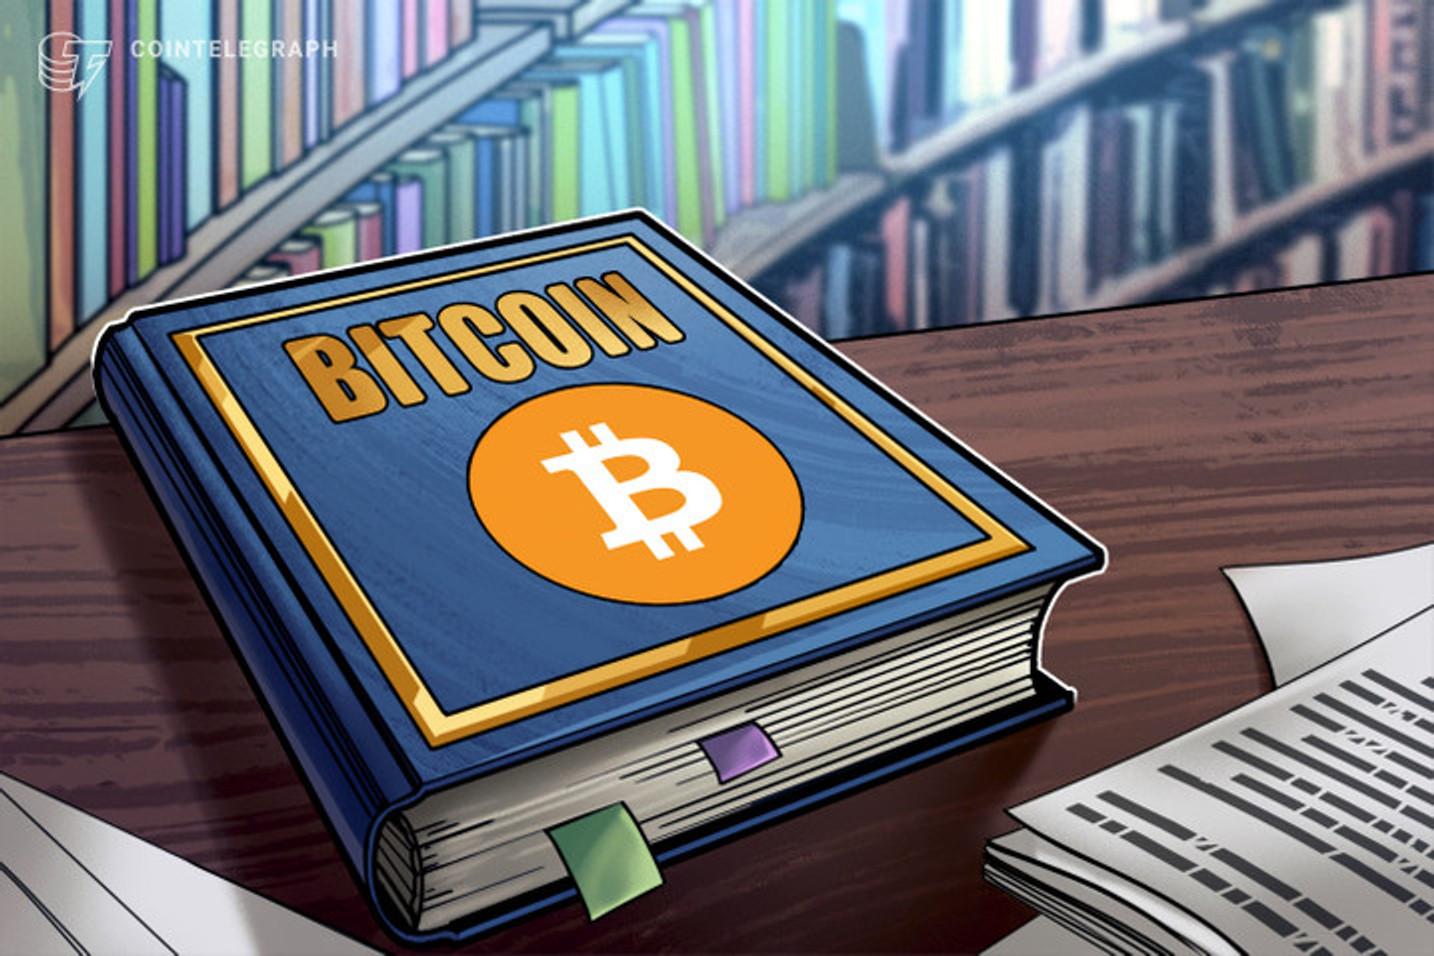 PUC Rio abre curso sobre Bitcoin, Blockchain e a Revolução Financeira